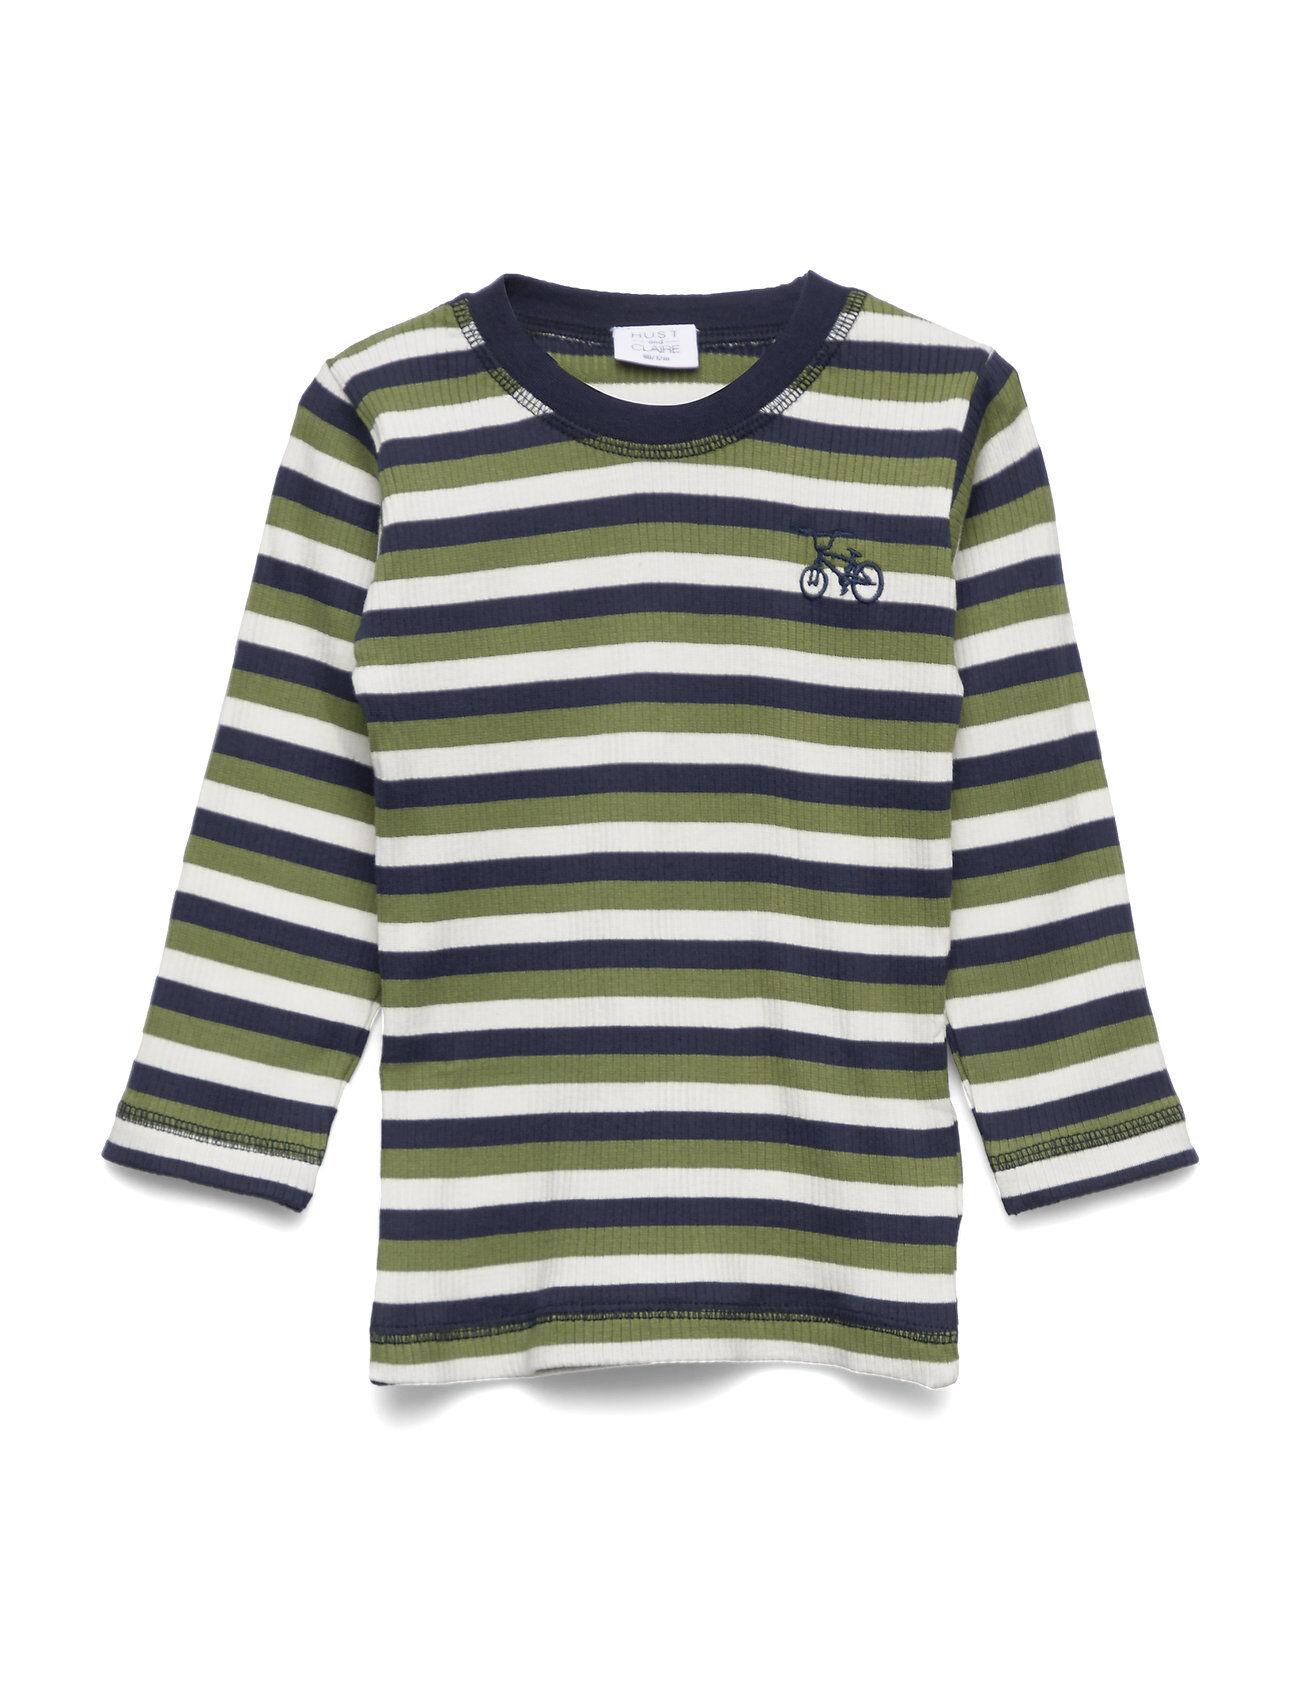 Hust & Claire Asp - T-Shirt L/S T-shirts Long-sleeved T-shirts Vihreä Hust & Claire